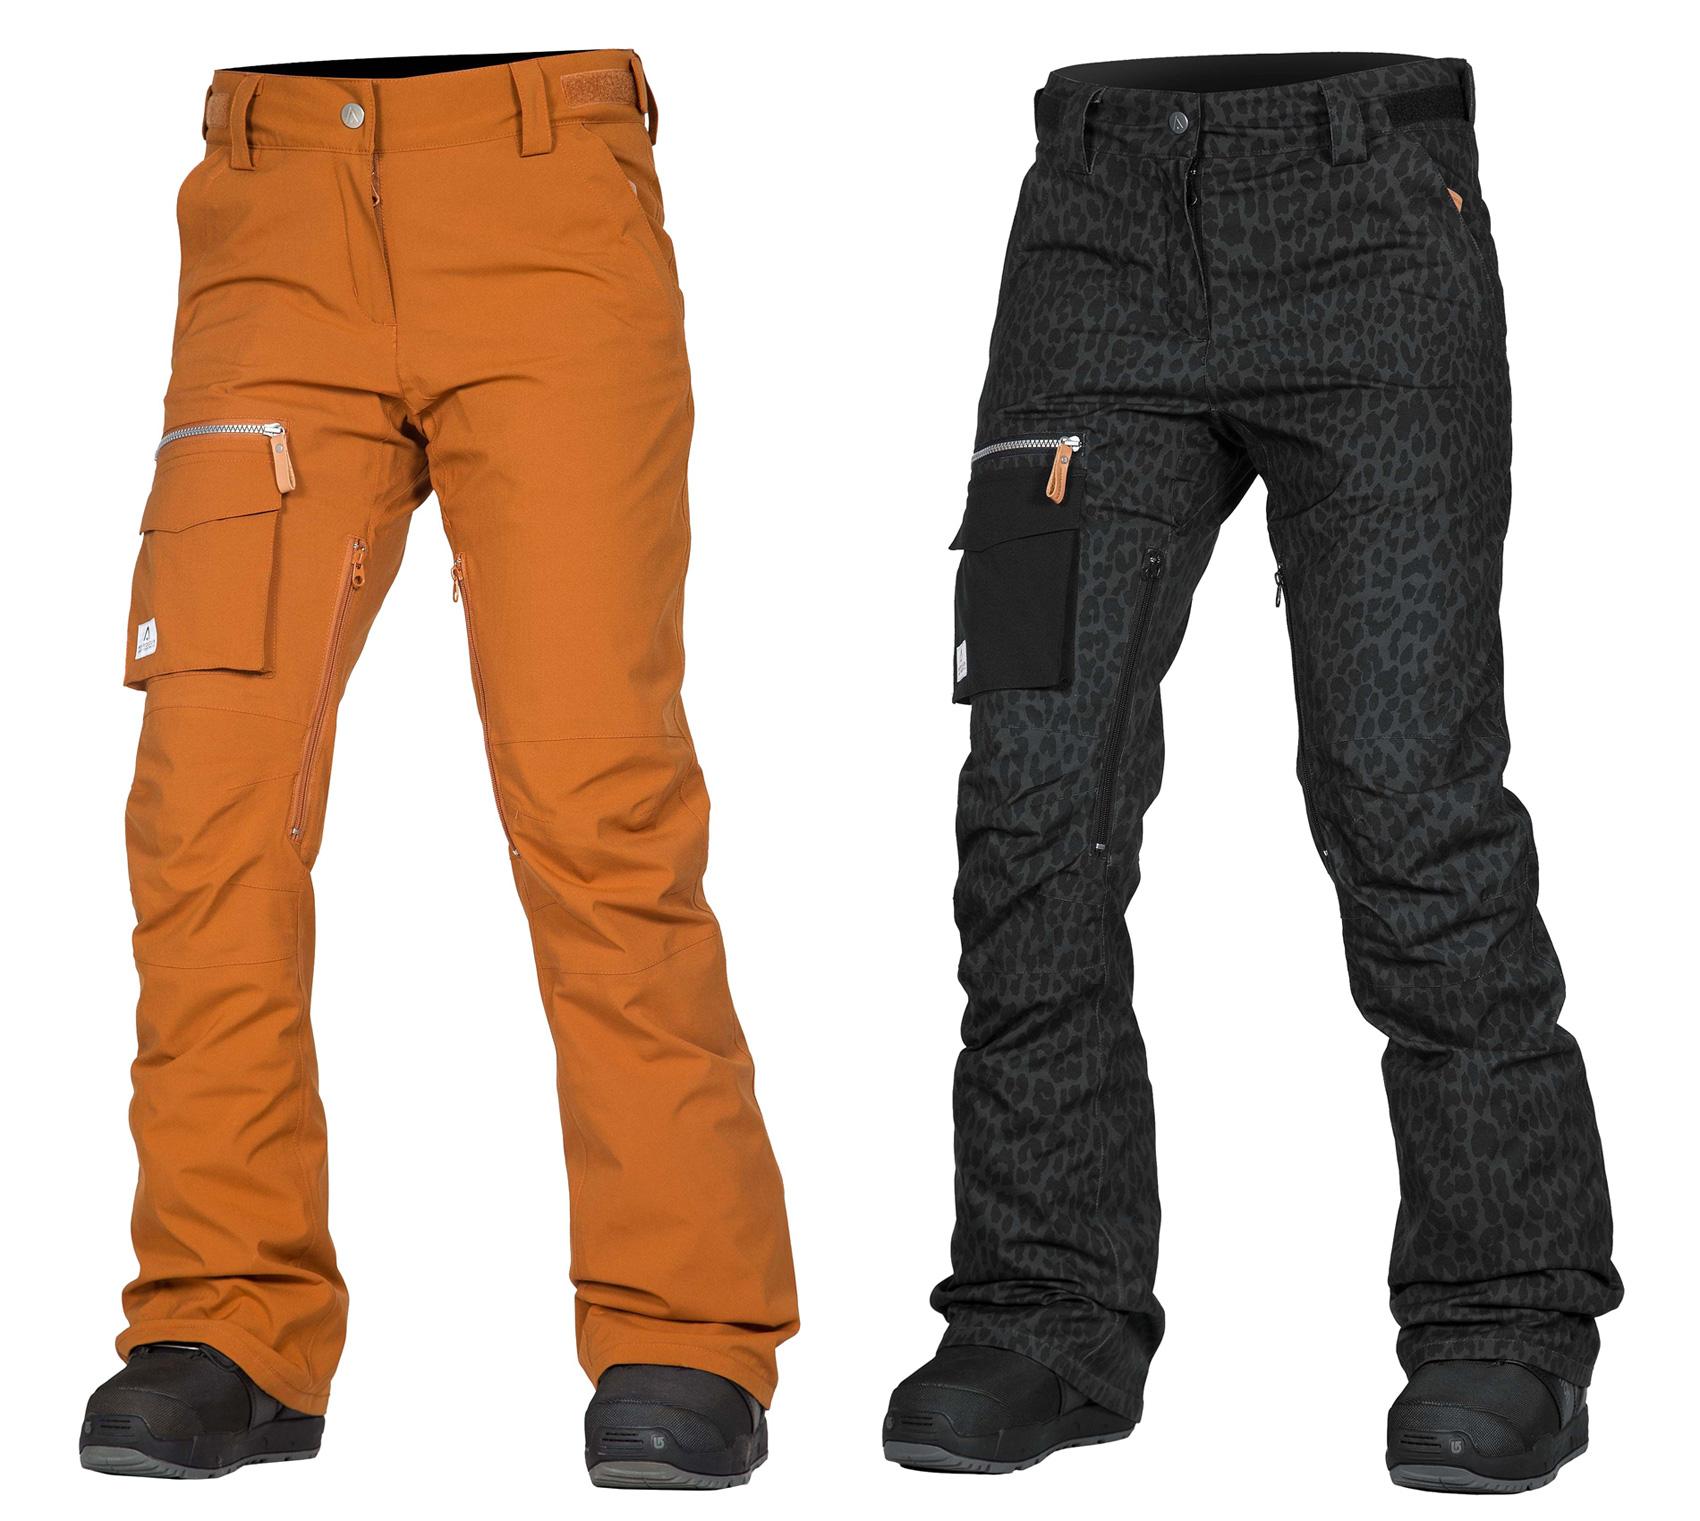 Sentinel Wear Colour Womens Snowboard Pants - Slant - Ladies Ski Trousers -  2018 22fd9dae0